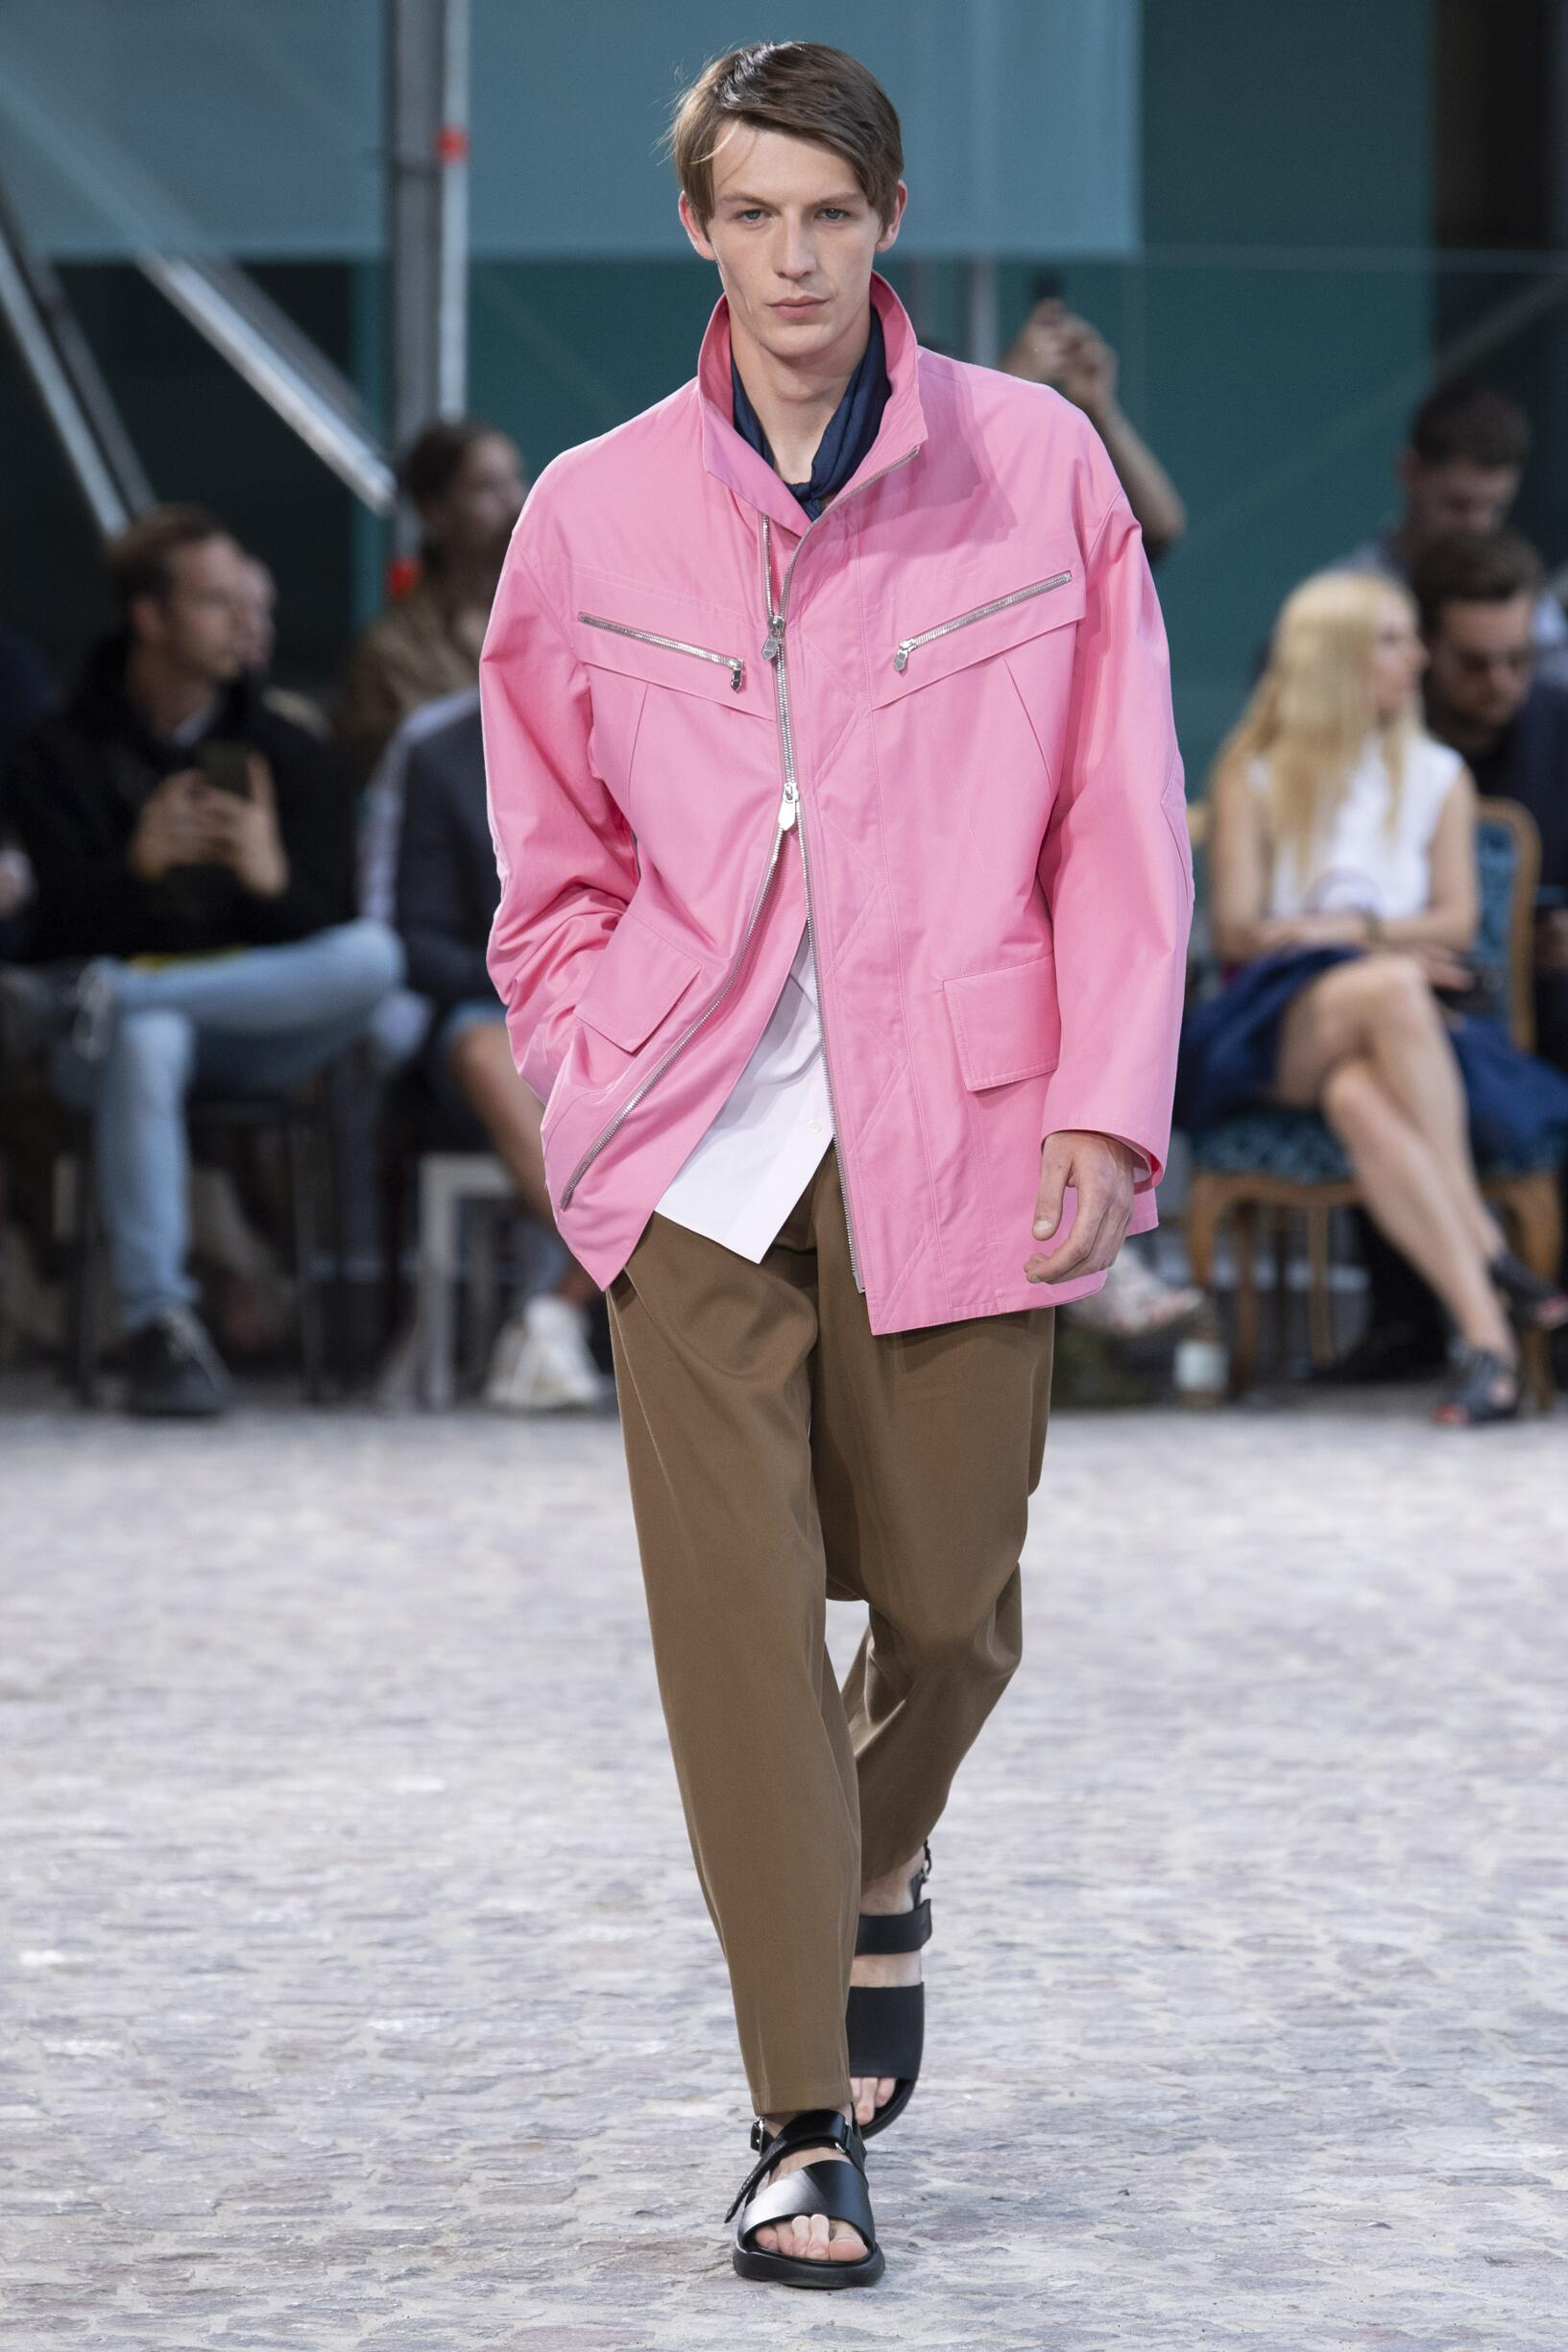 Hermès Spring 2020 Catwalk